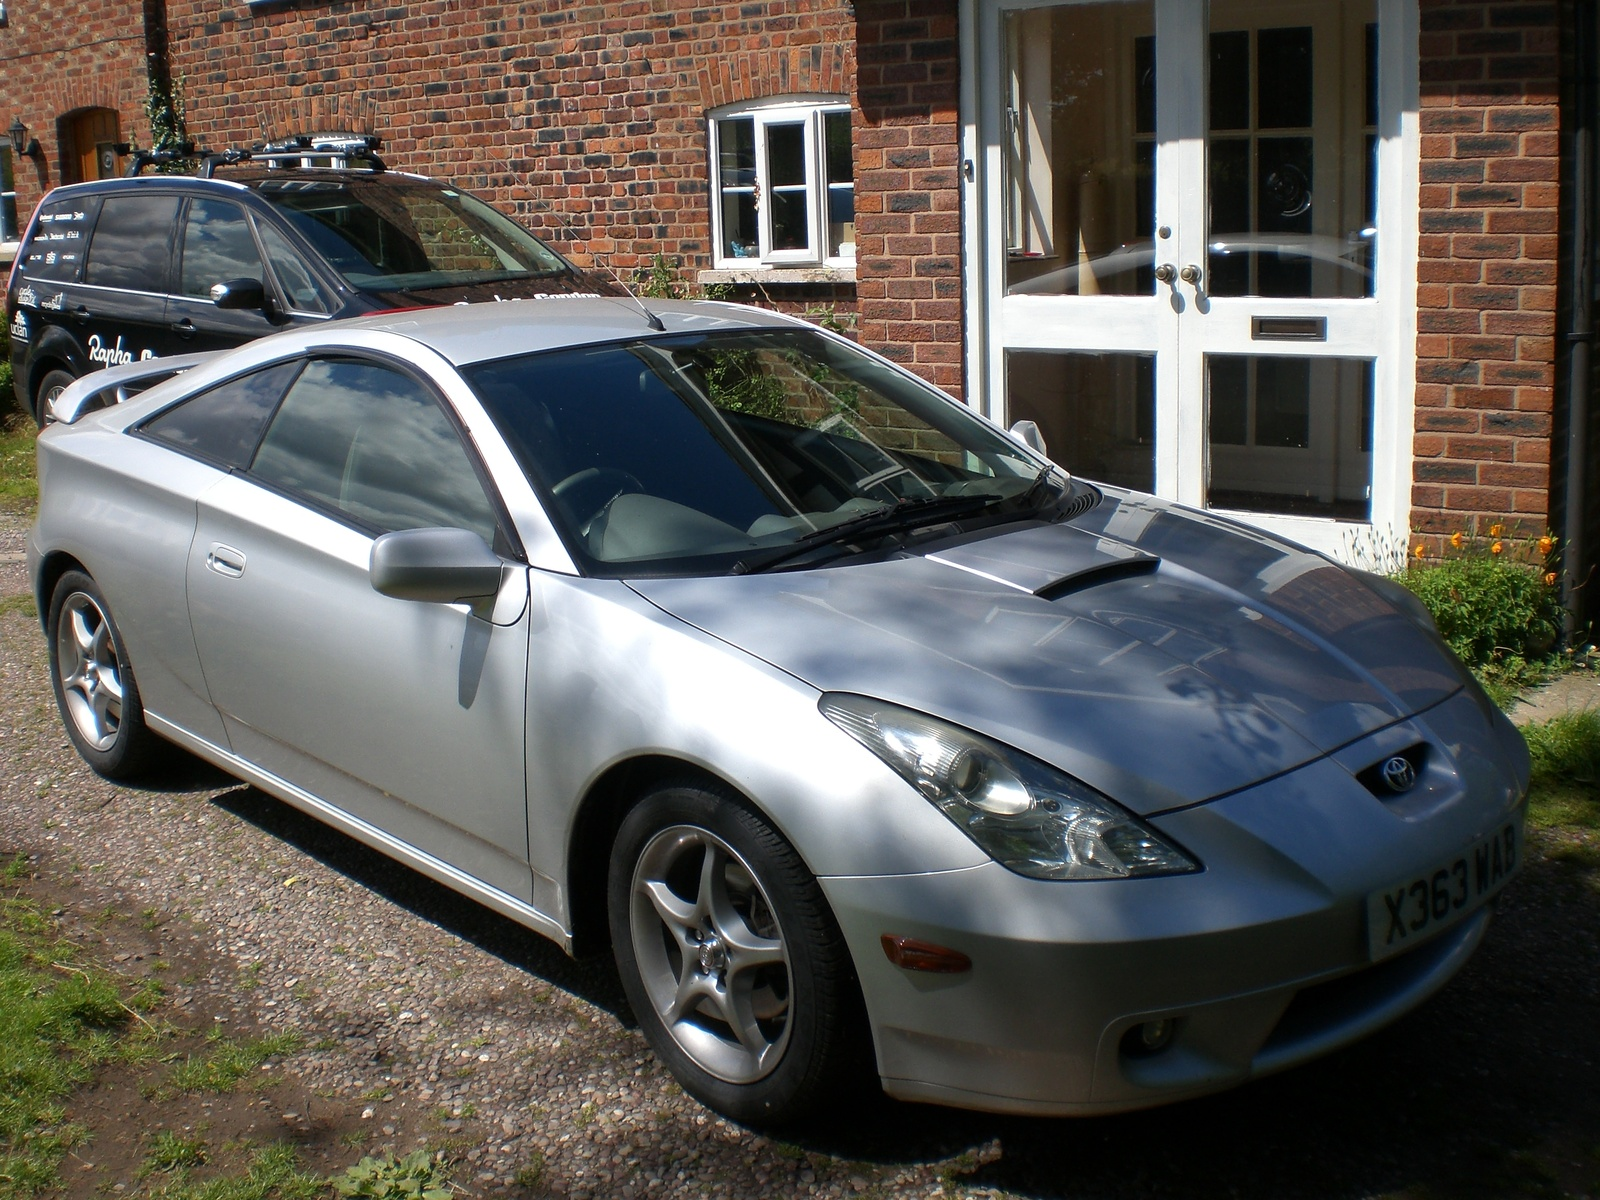 2001 Toyota Celica GTS picture, exterior